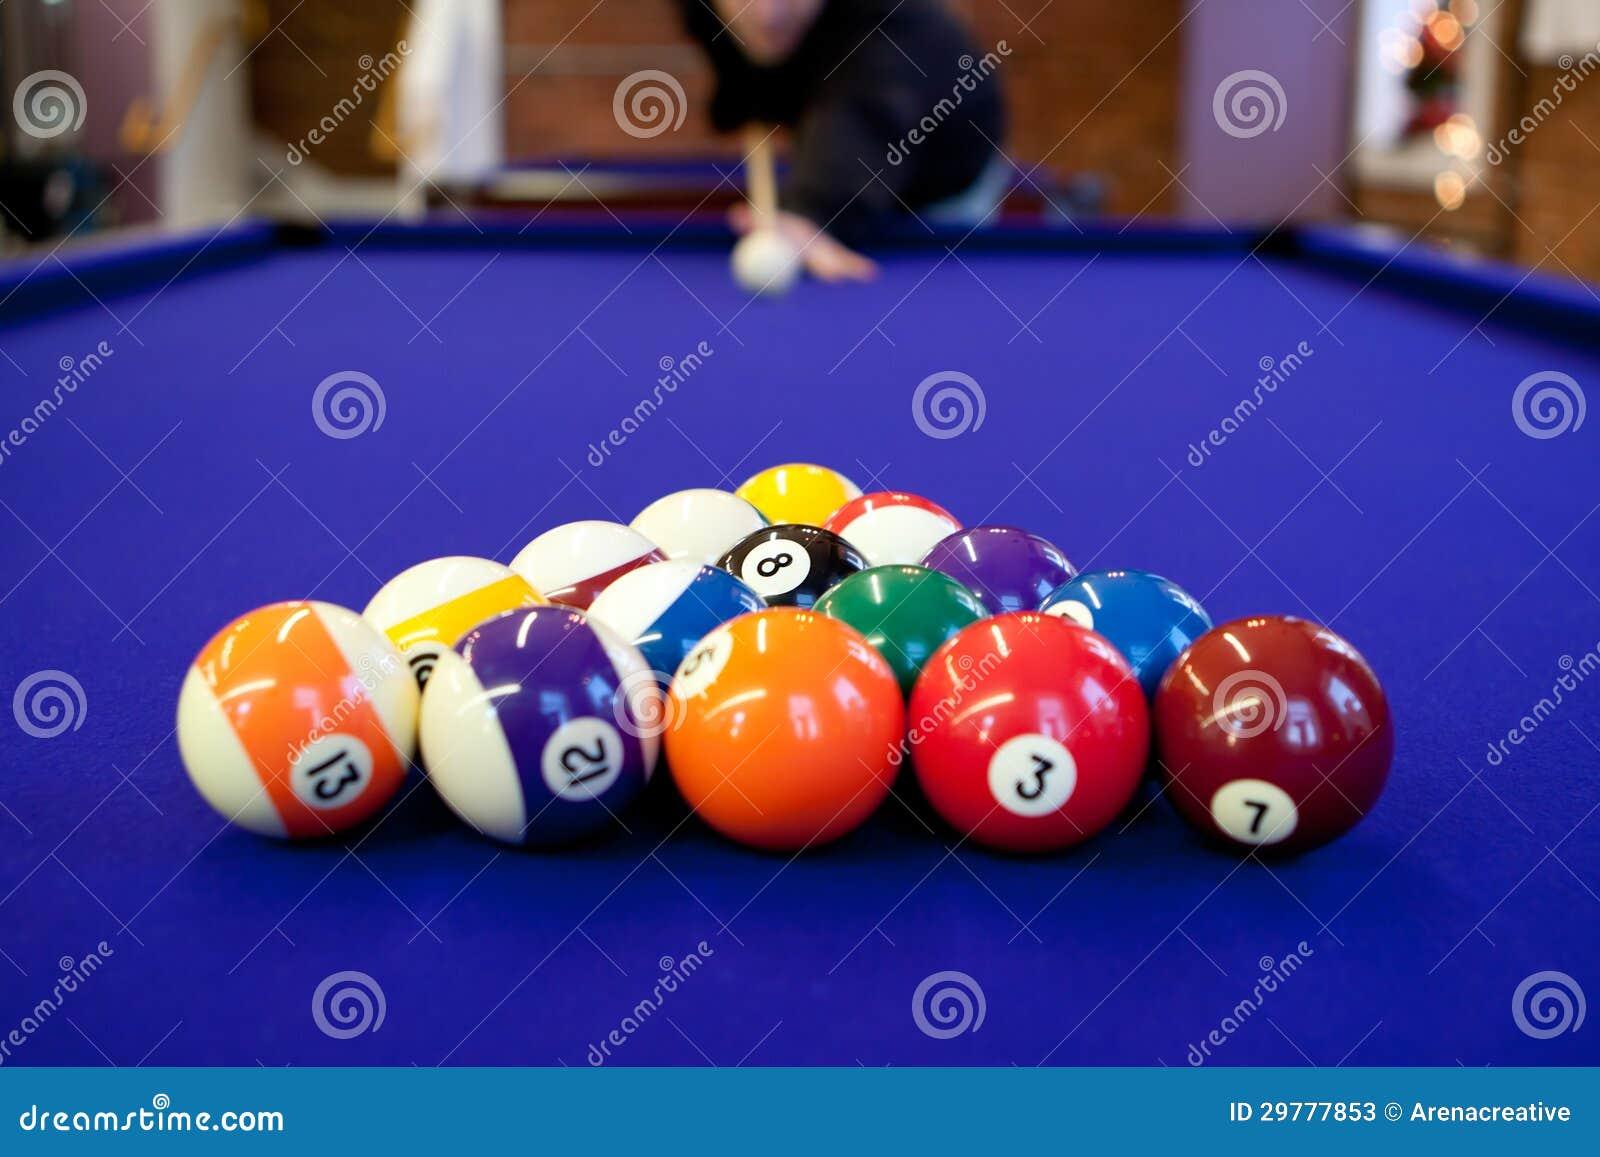 Pool Hall Billiards Stock Image Image Of Playing Hobby